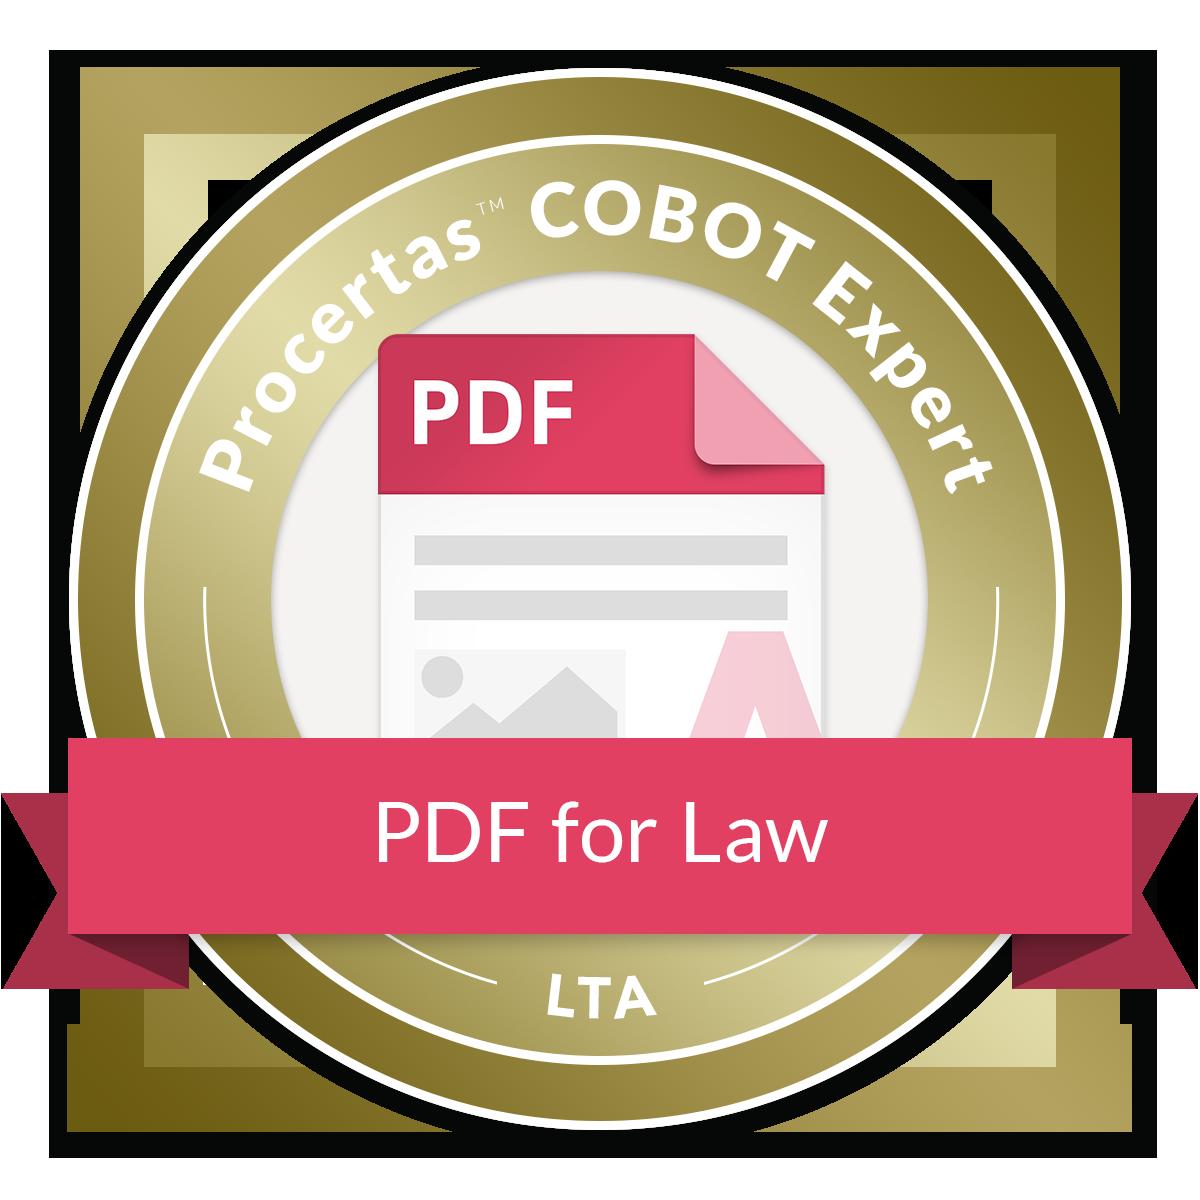 COBOT Expert - PDF for Law